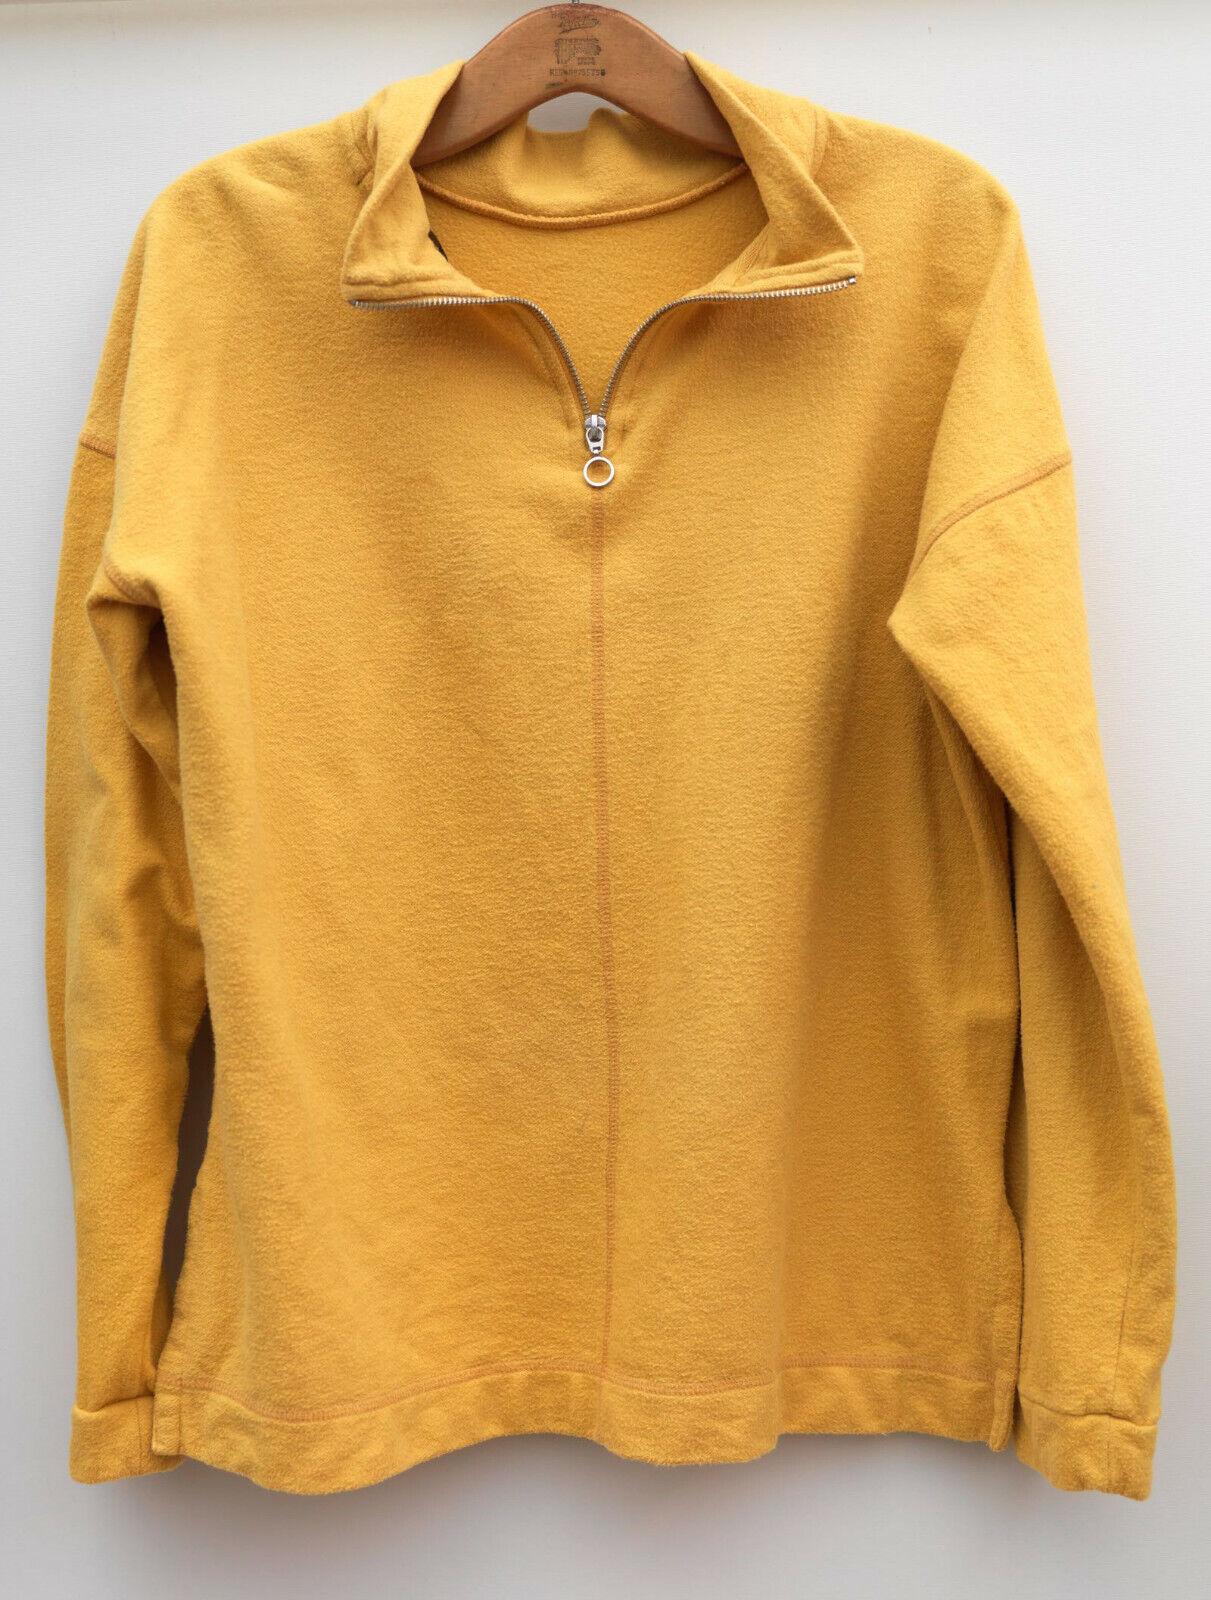 NEXT cotton sweatshirt top size 14